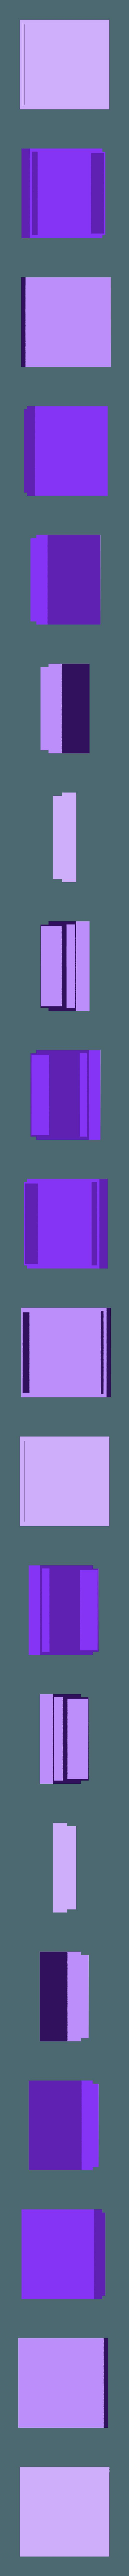 box_bottom.stl Download free STL file Pumpkin Lamp • 3D printer design, sui77